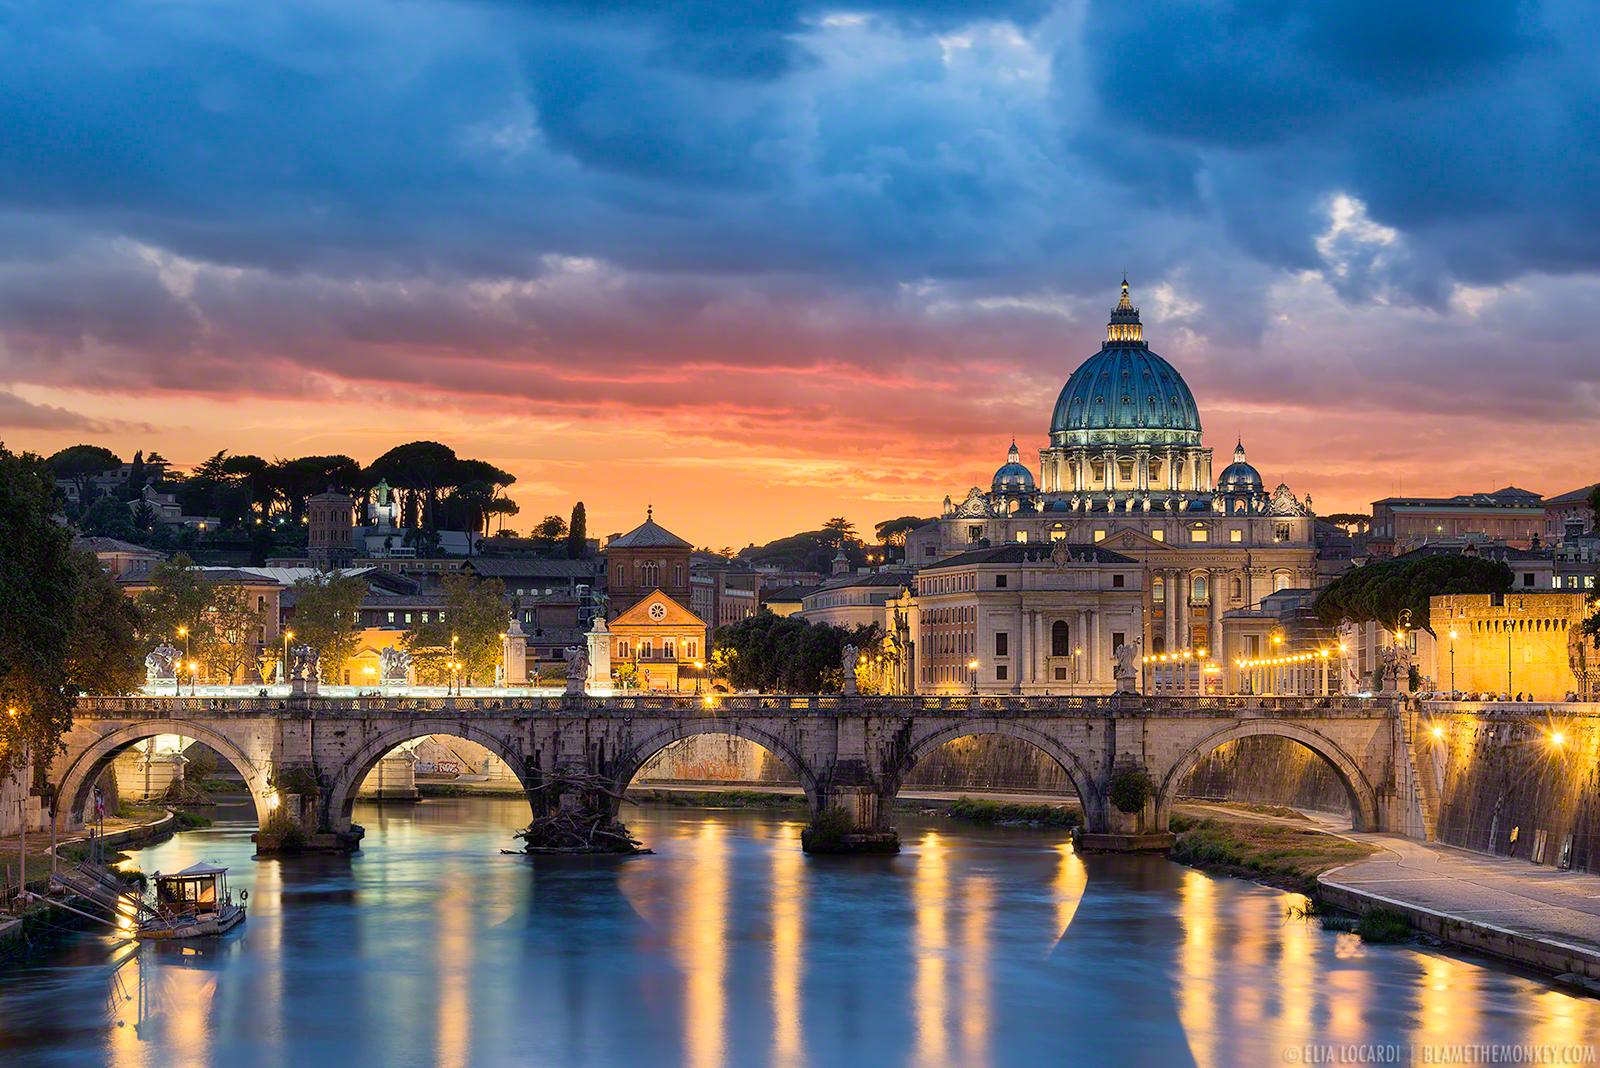 Elia-Locardi-Travel-Photography-Roman-Radiance-Rome-Italy-1600-WM-DM.jpg